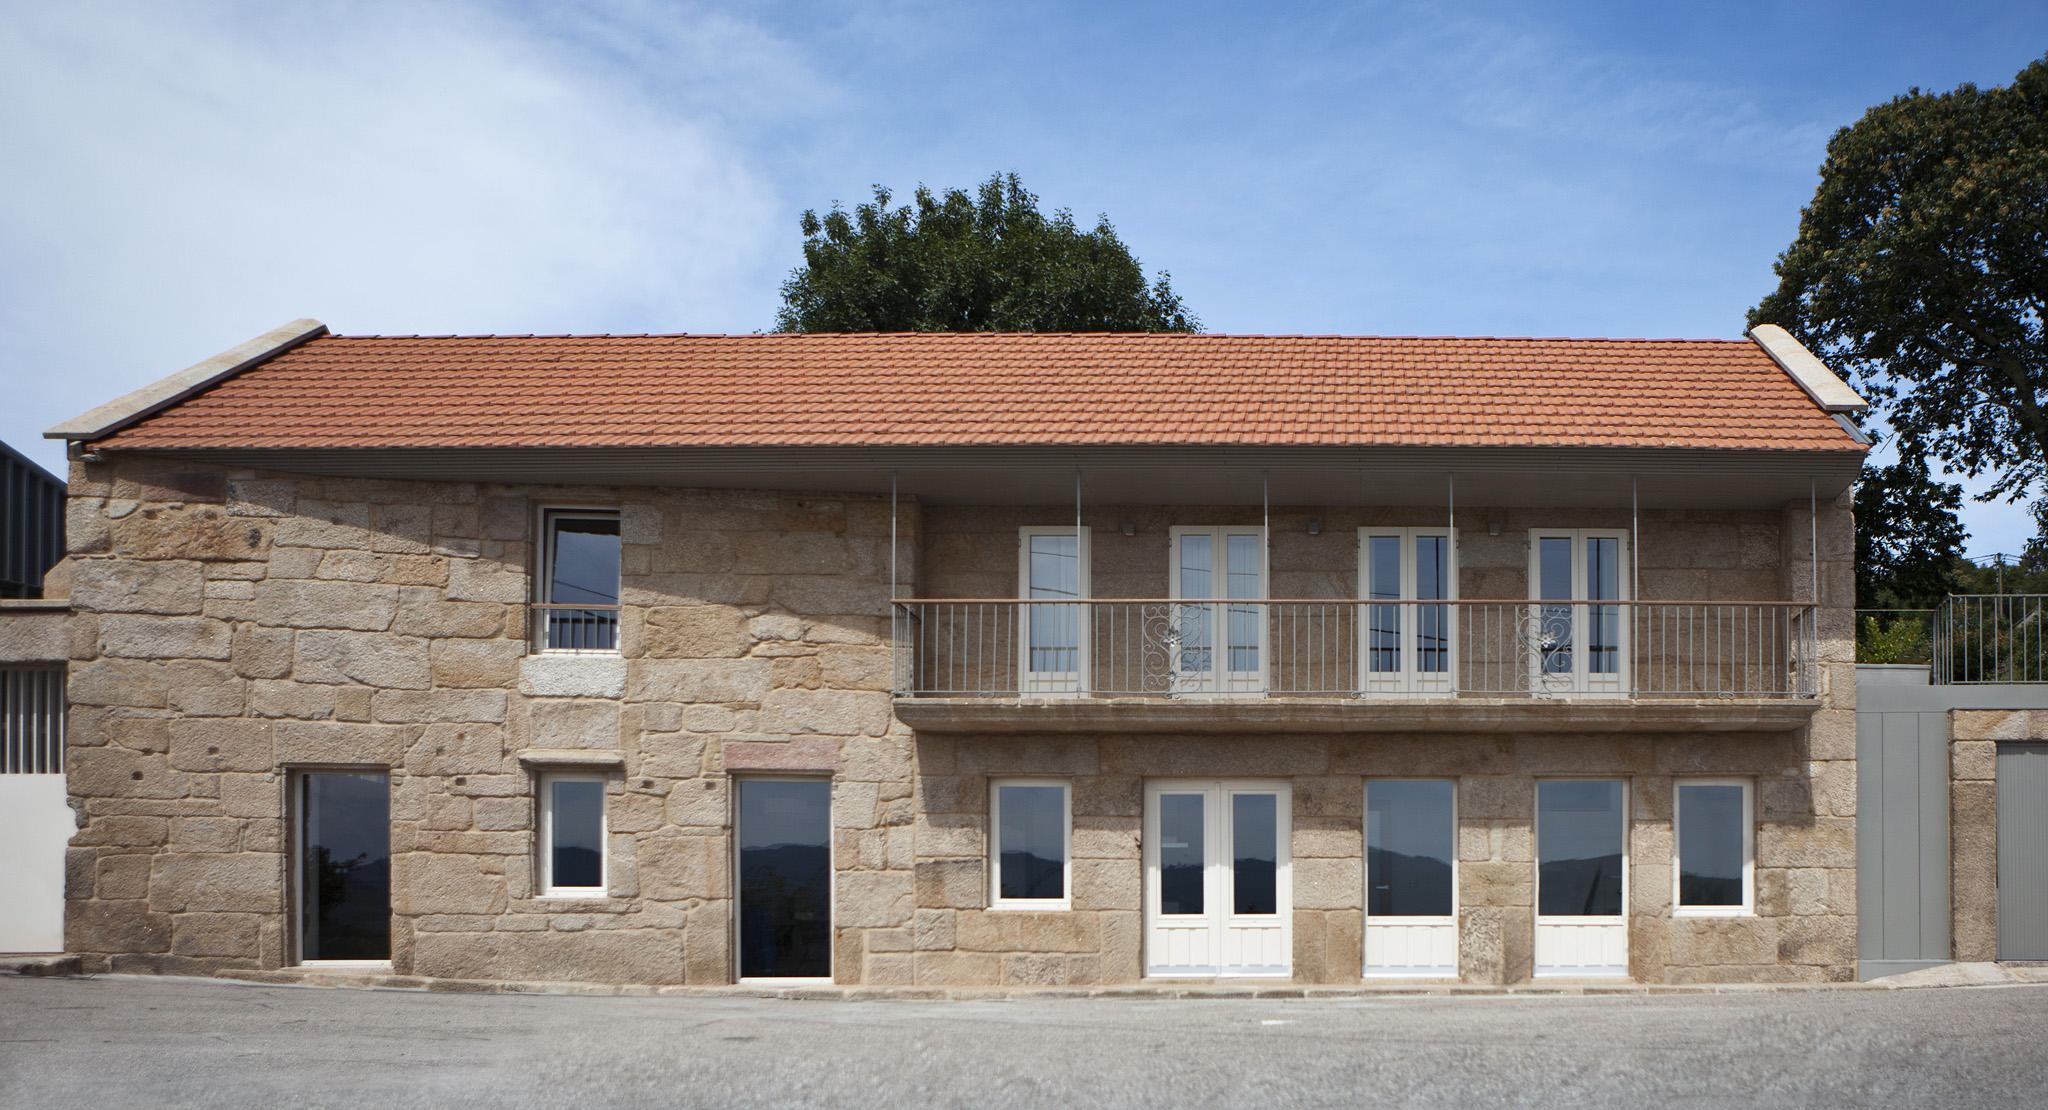 Rehabilitacion vivienda tradicional moscoso fachada piedra for Fachada tradicional